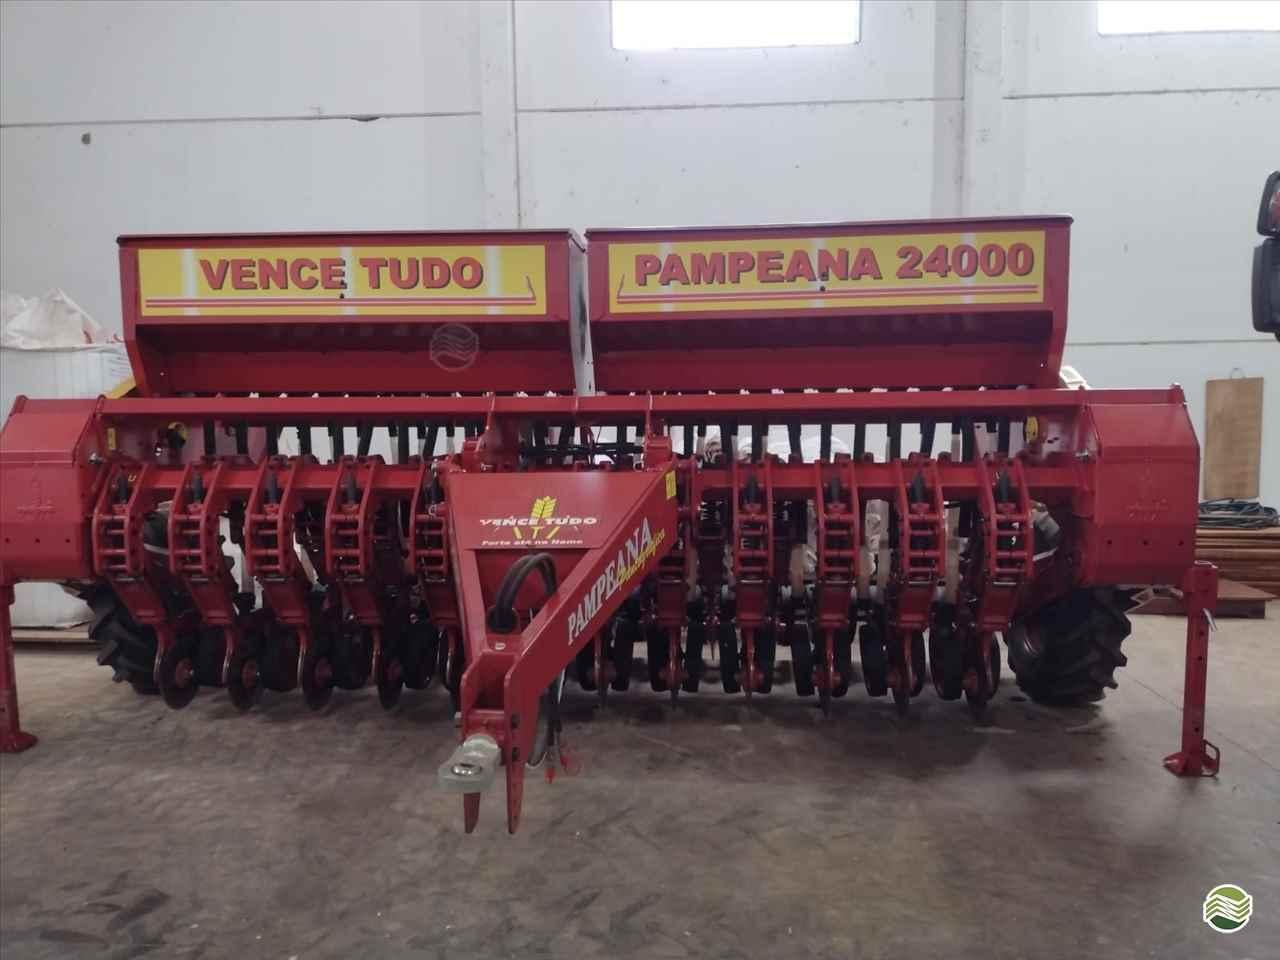 SEMEADEIRA VENCE TUDO PAMPEANA 24000 Central Agro CASCAVEL PARANÁ PR